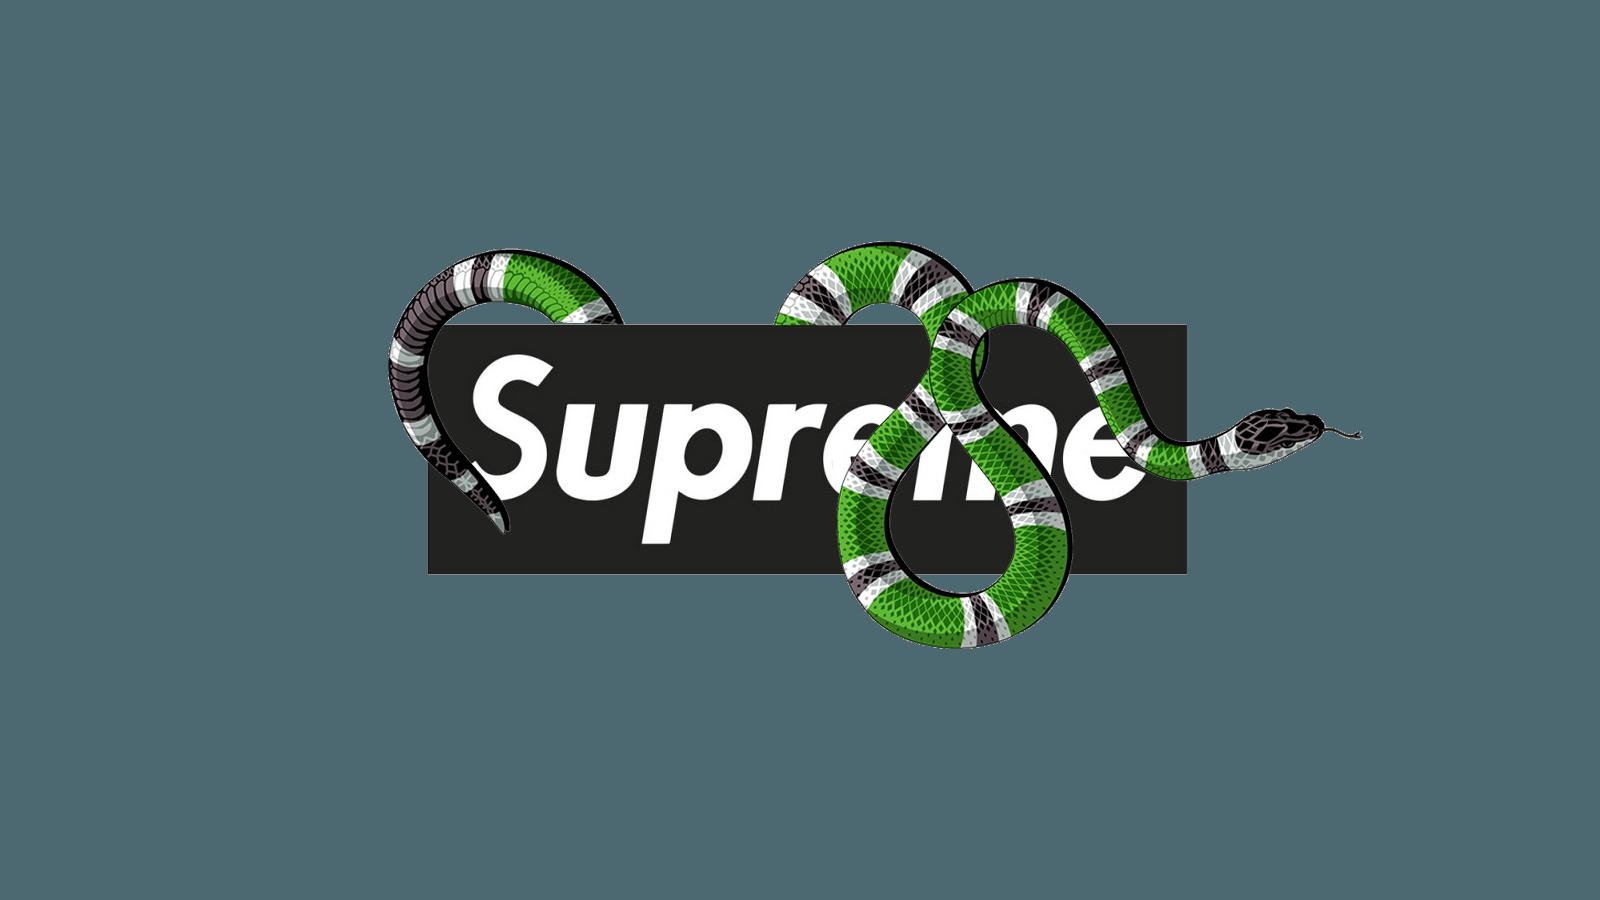 Supreme And Gucci Wallpapers - Wallpaper Cave - Gucci Logo Colors